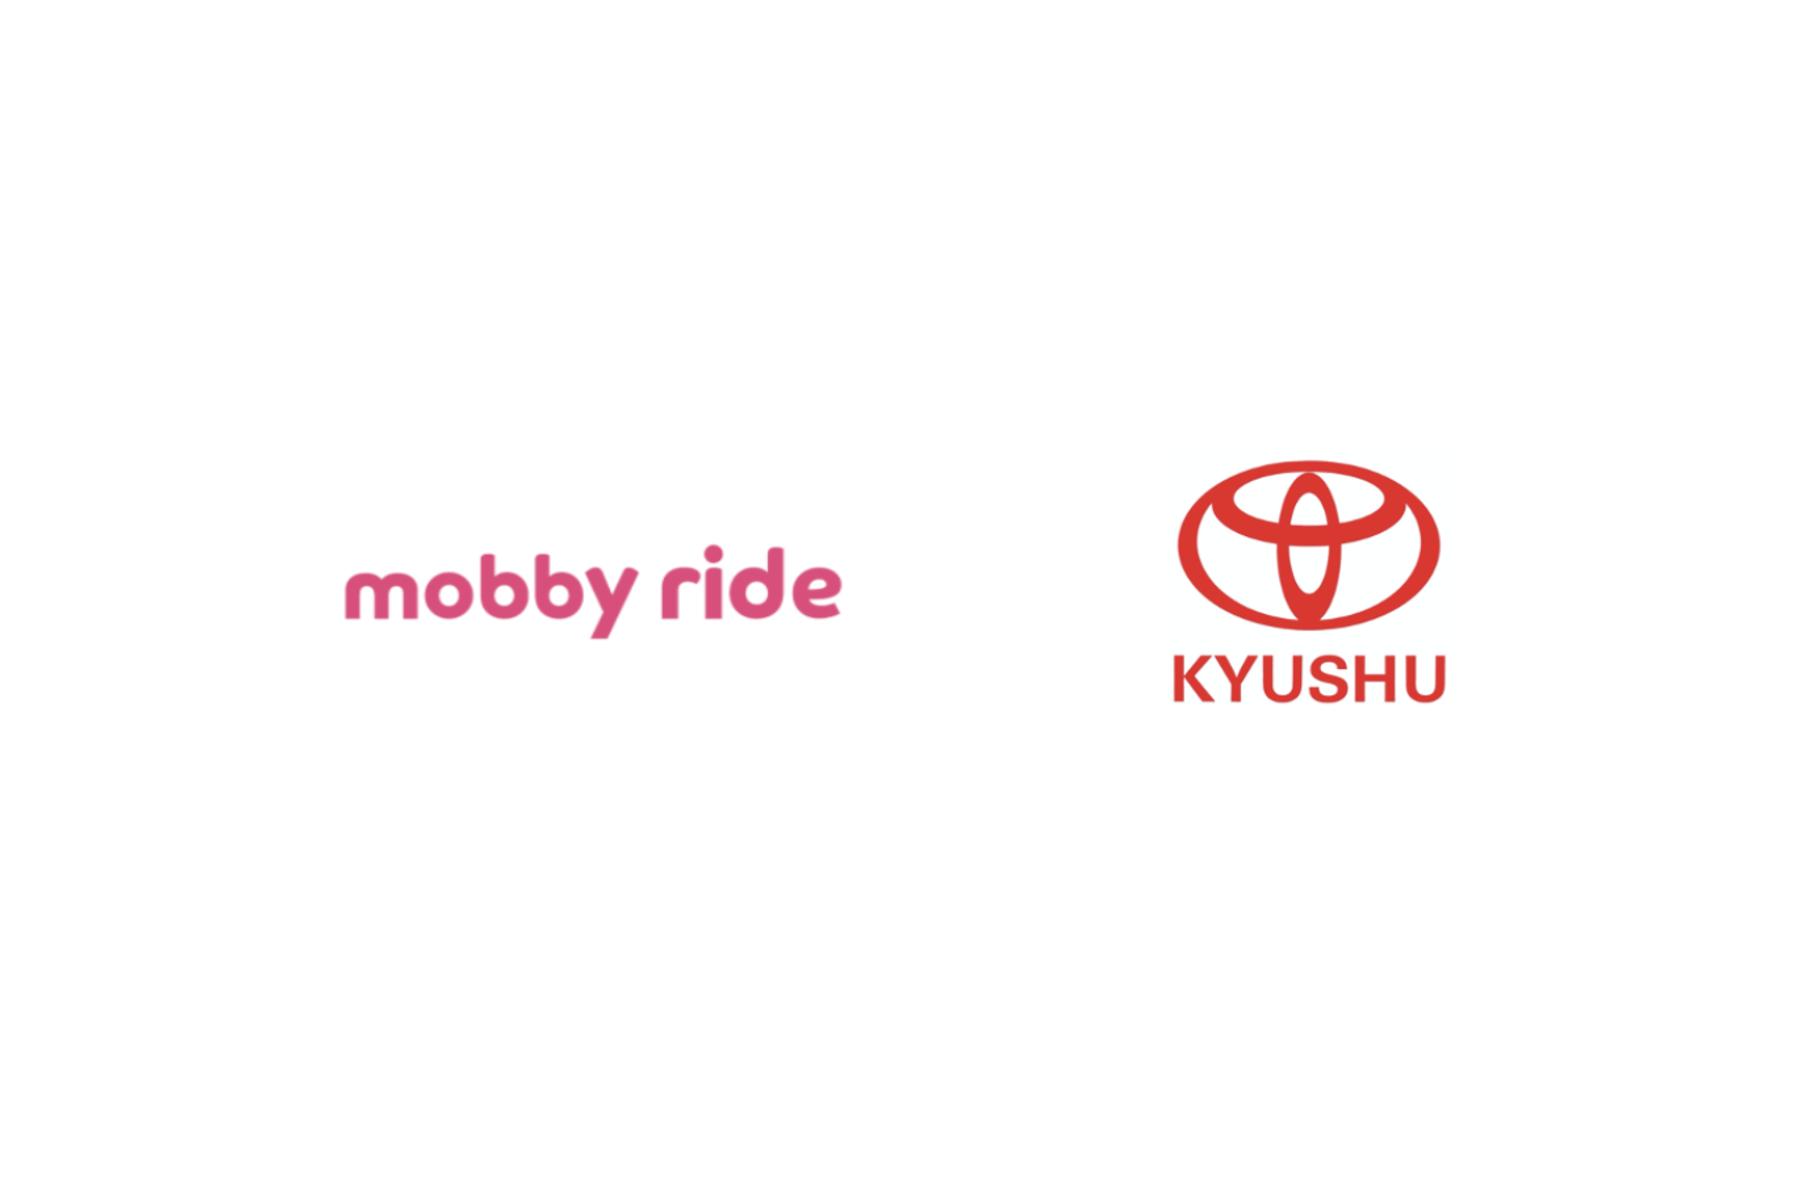 mobby ride×トヨタ自動車九州 | 宮田工場内の移動効率化を目指し、電動キックボードを大規模導入開始